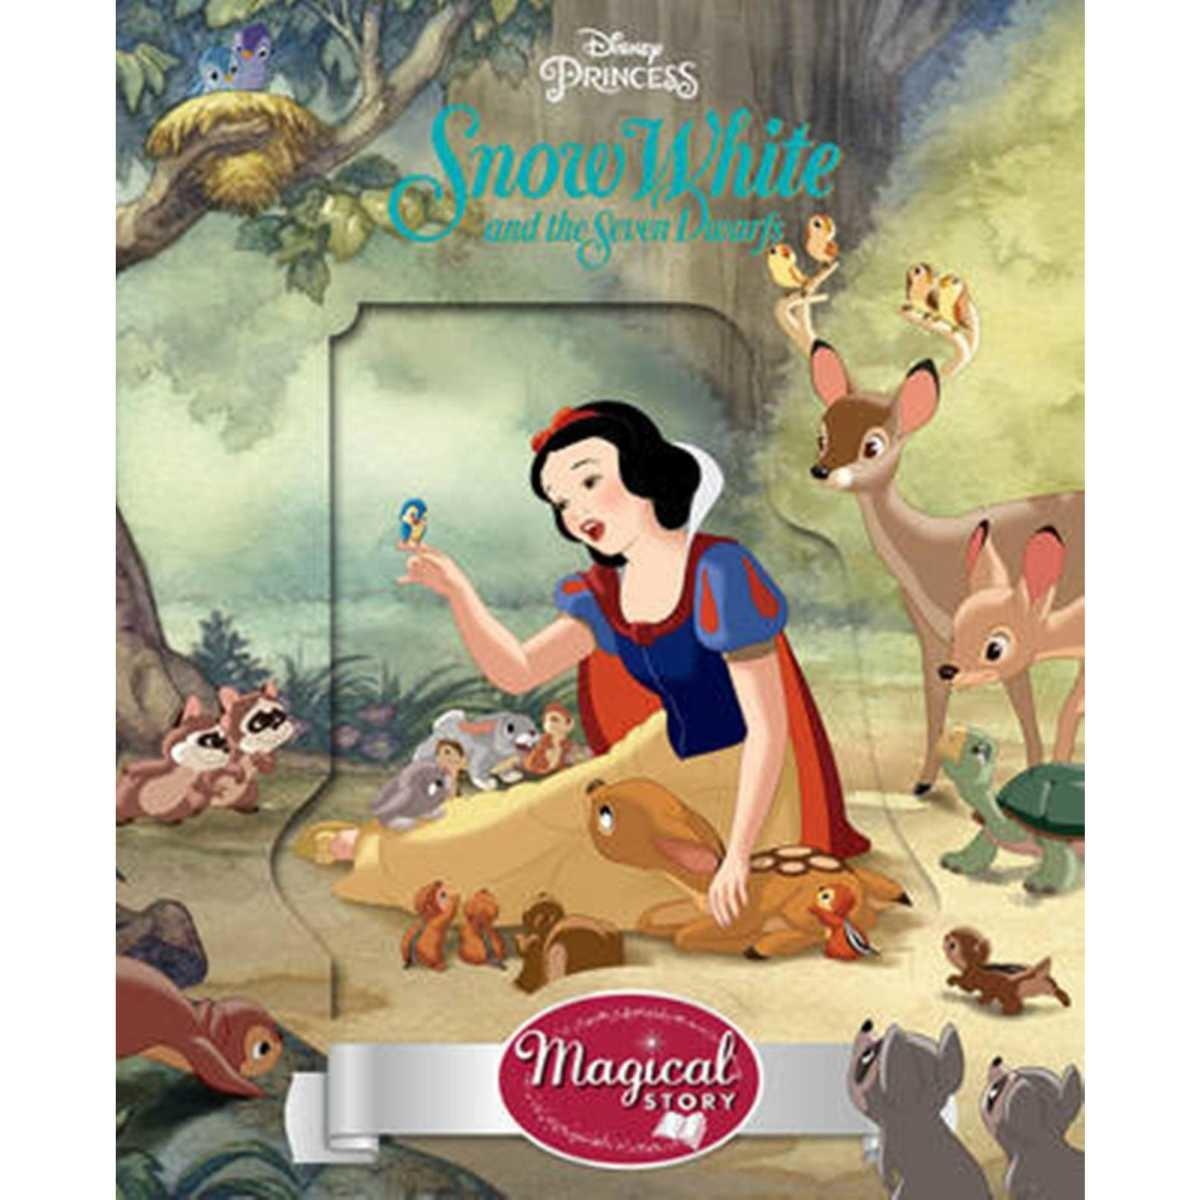 Disney Princess Snow White And The Seven Dwarfs Magical